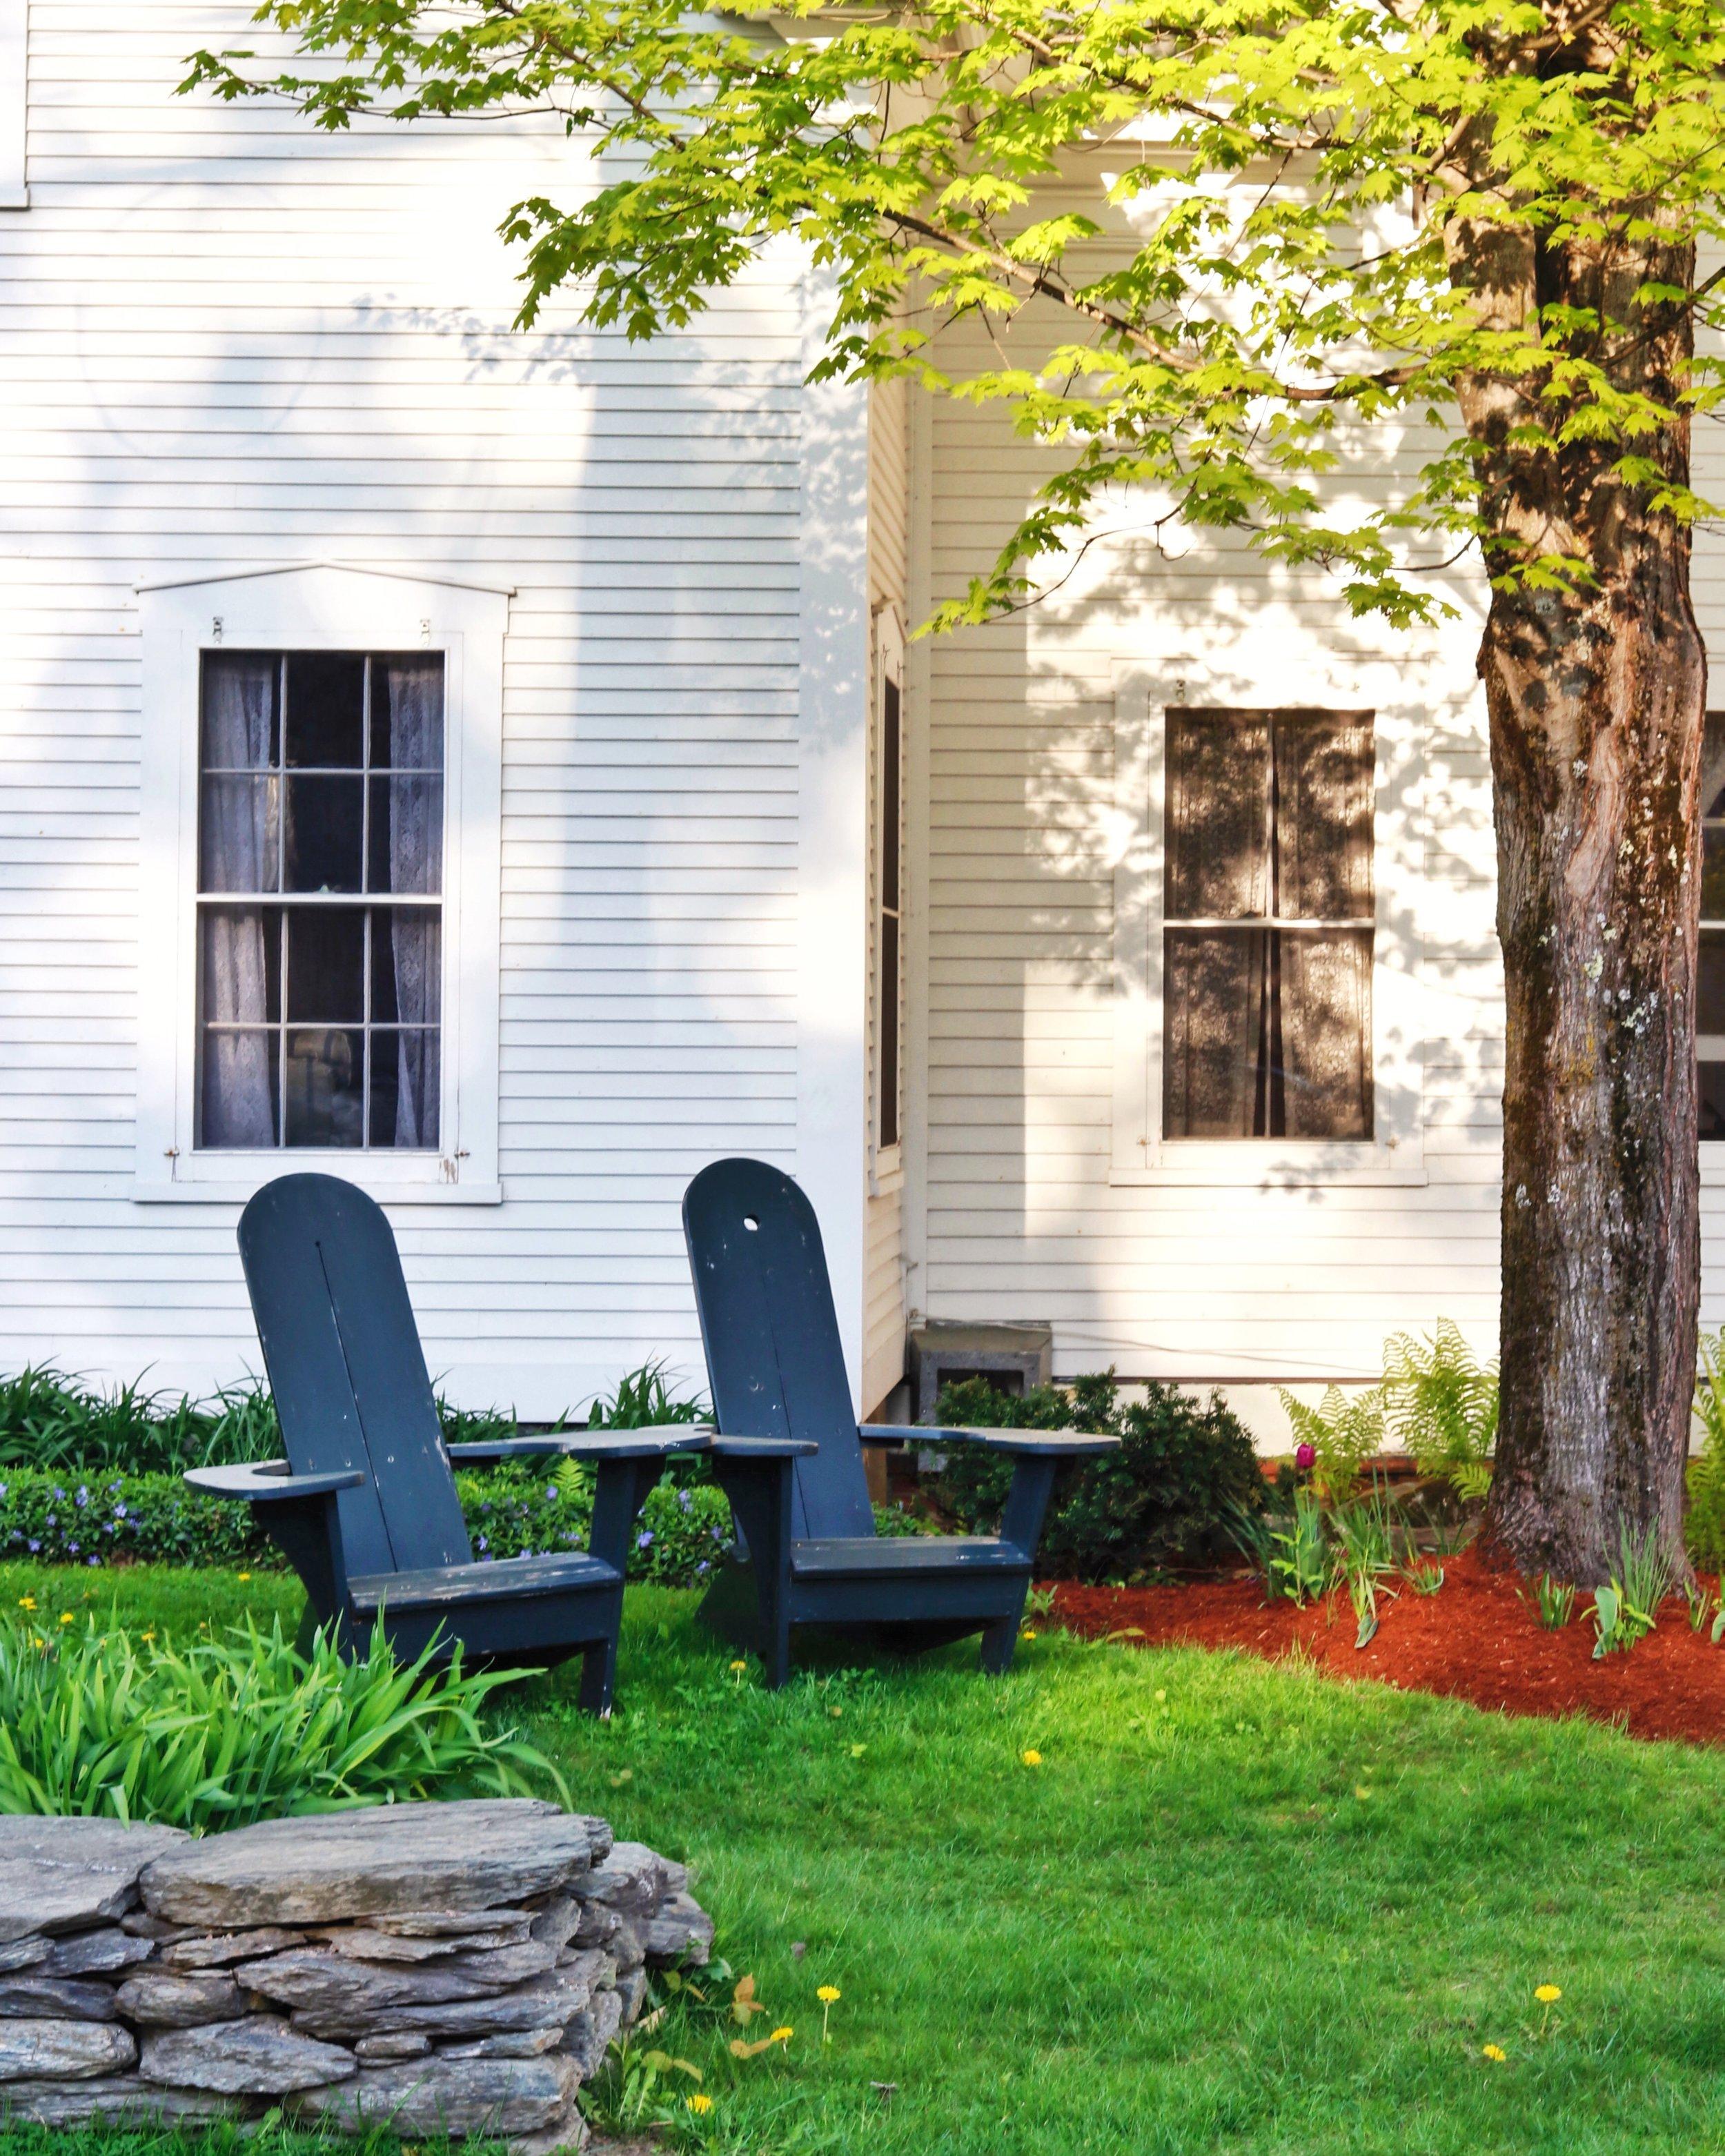 Pitcher Inn Adirondack Chairs